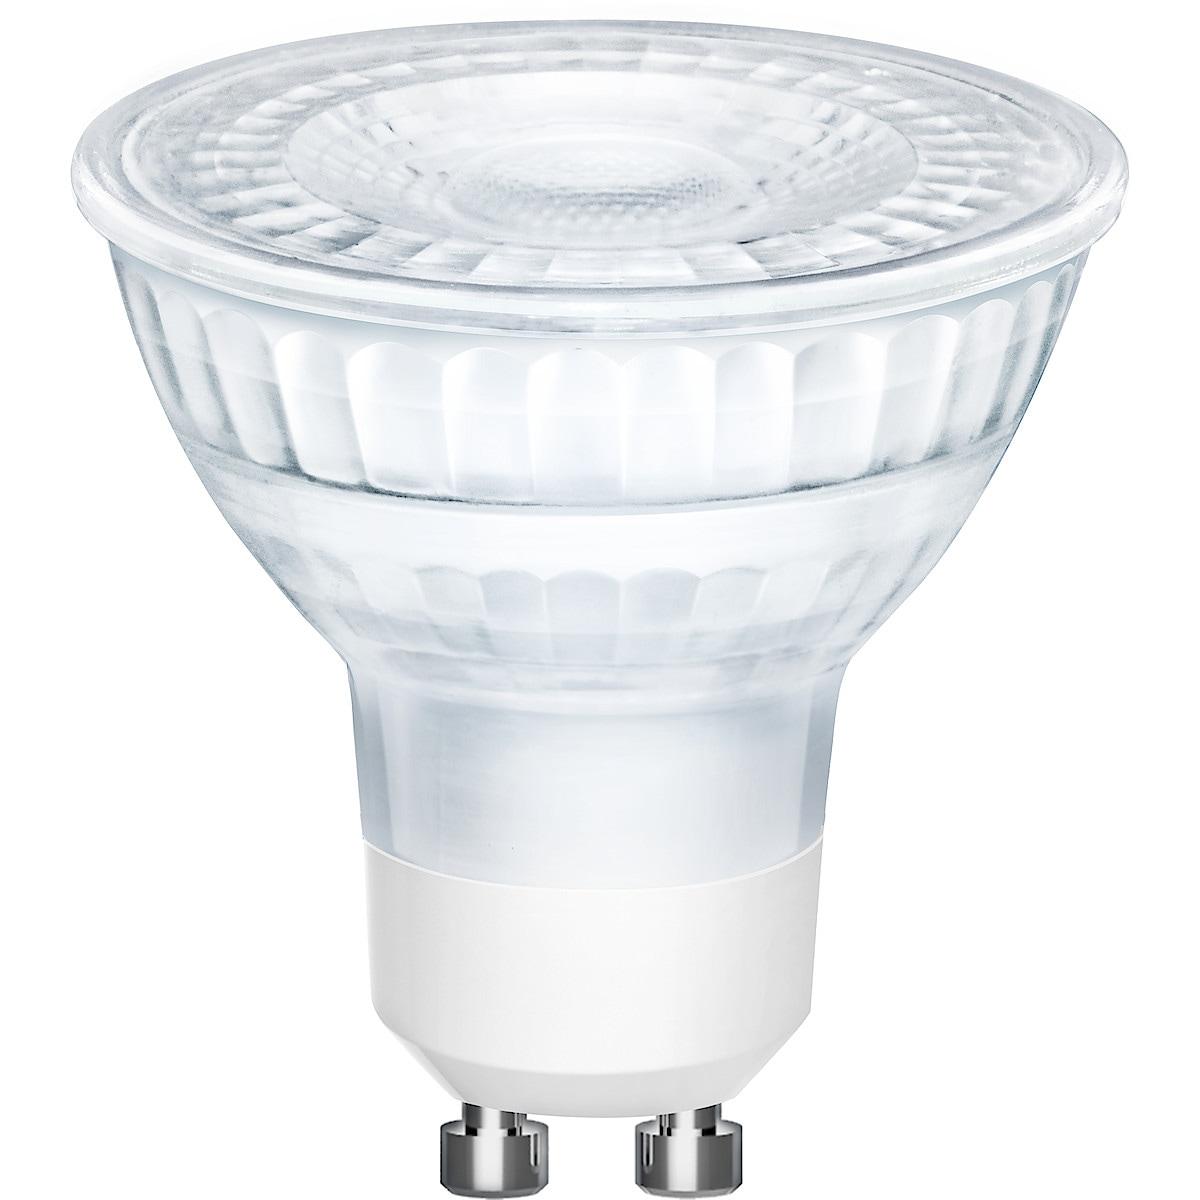 LED-Lampe GU10, Clas Ohlson